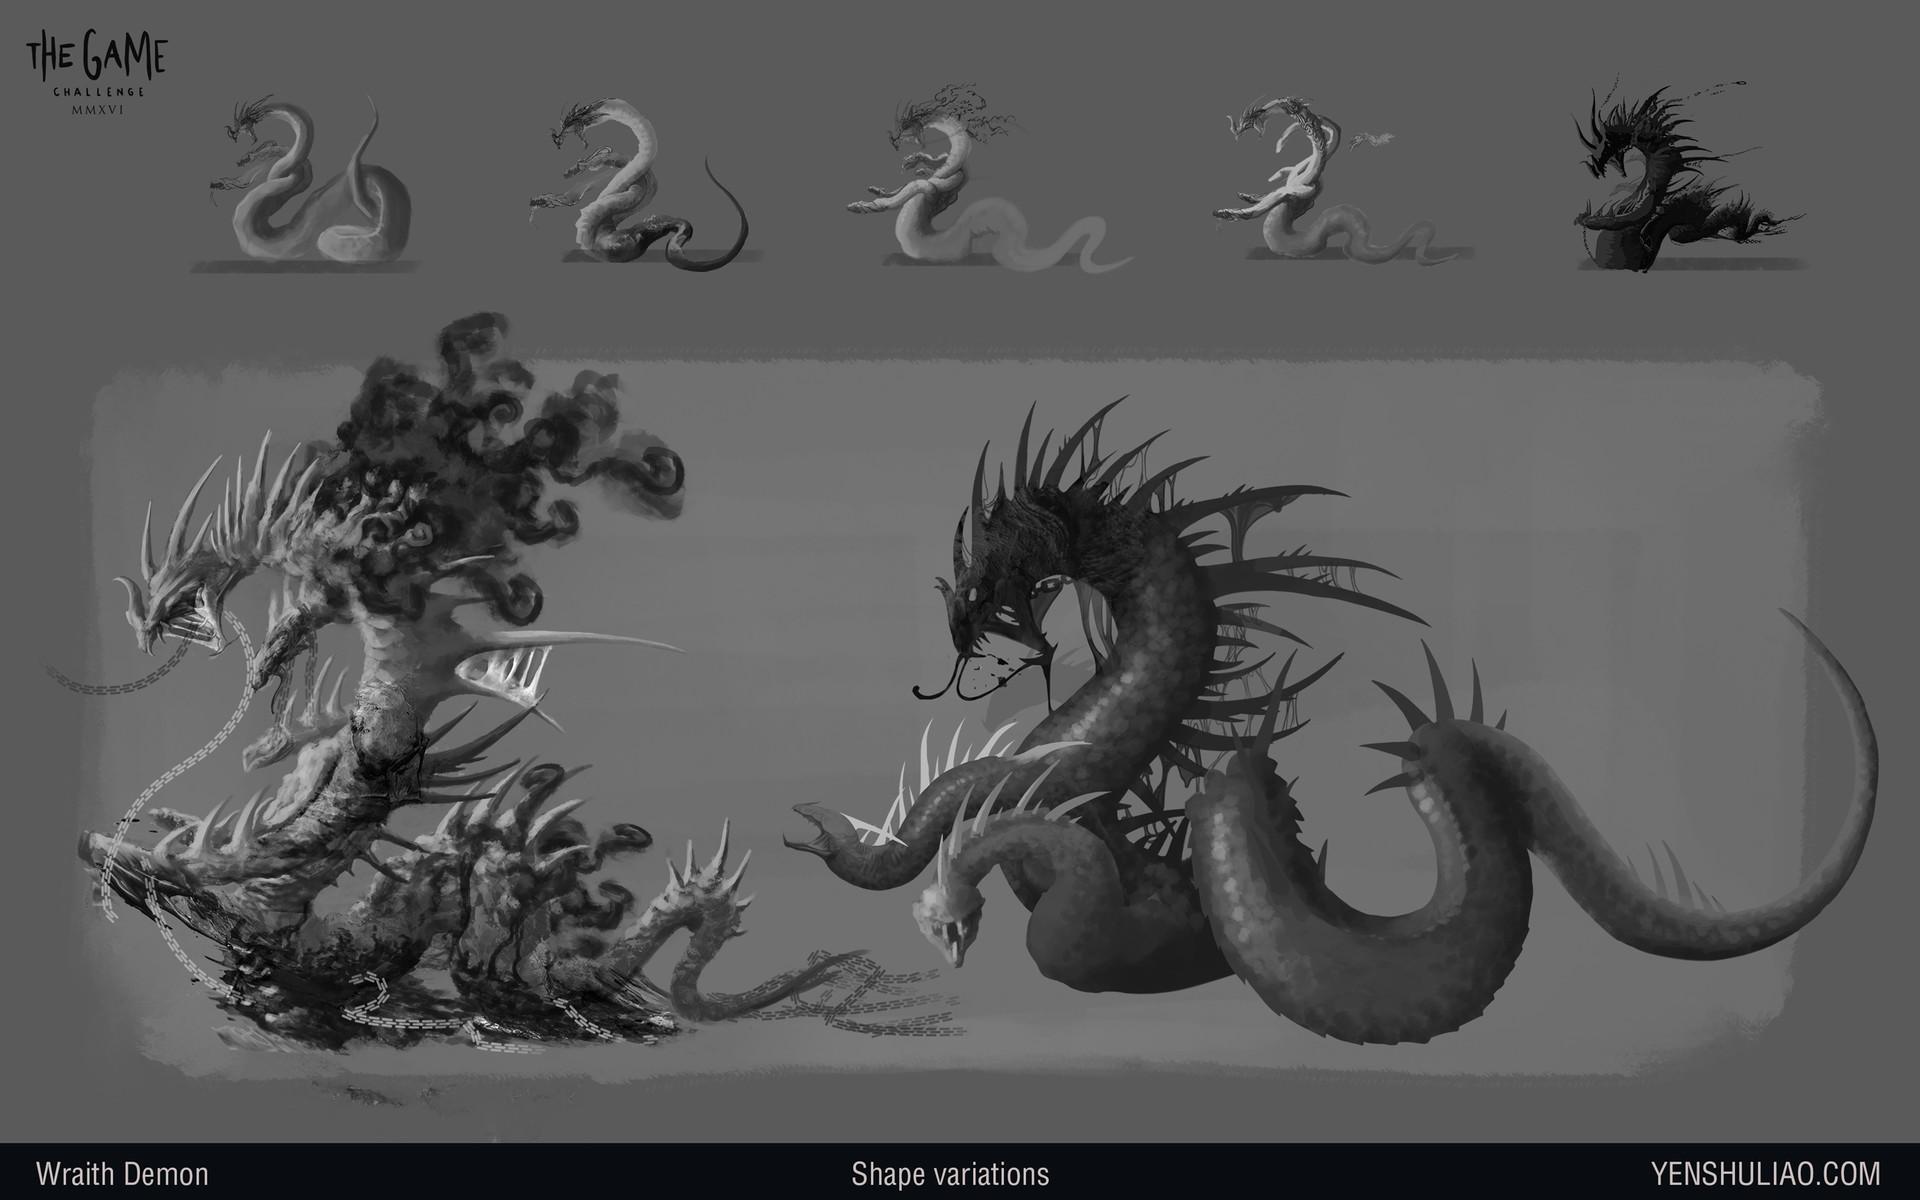 Yen shu liao demon dragon creature concept art02